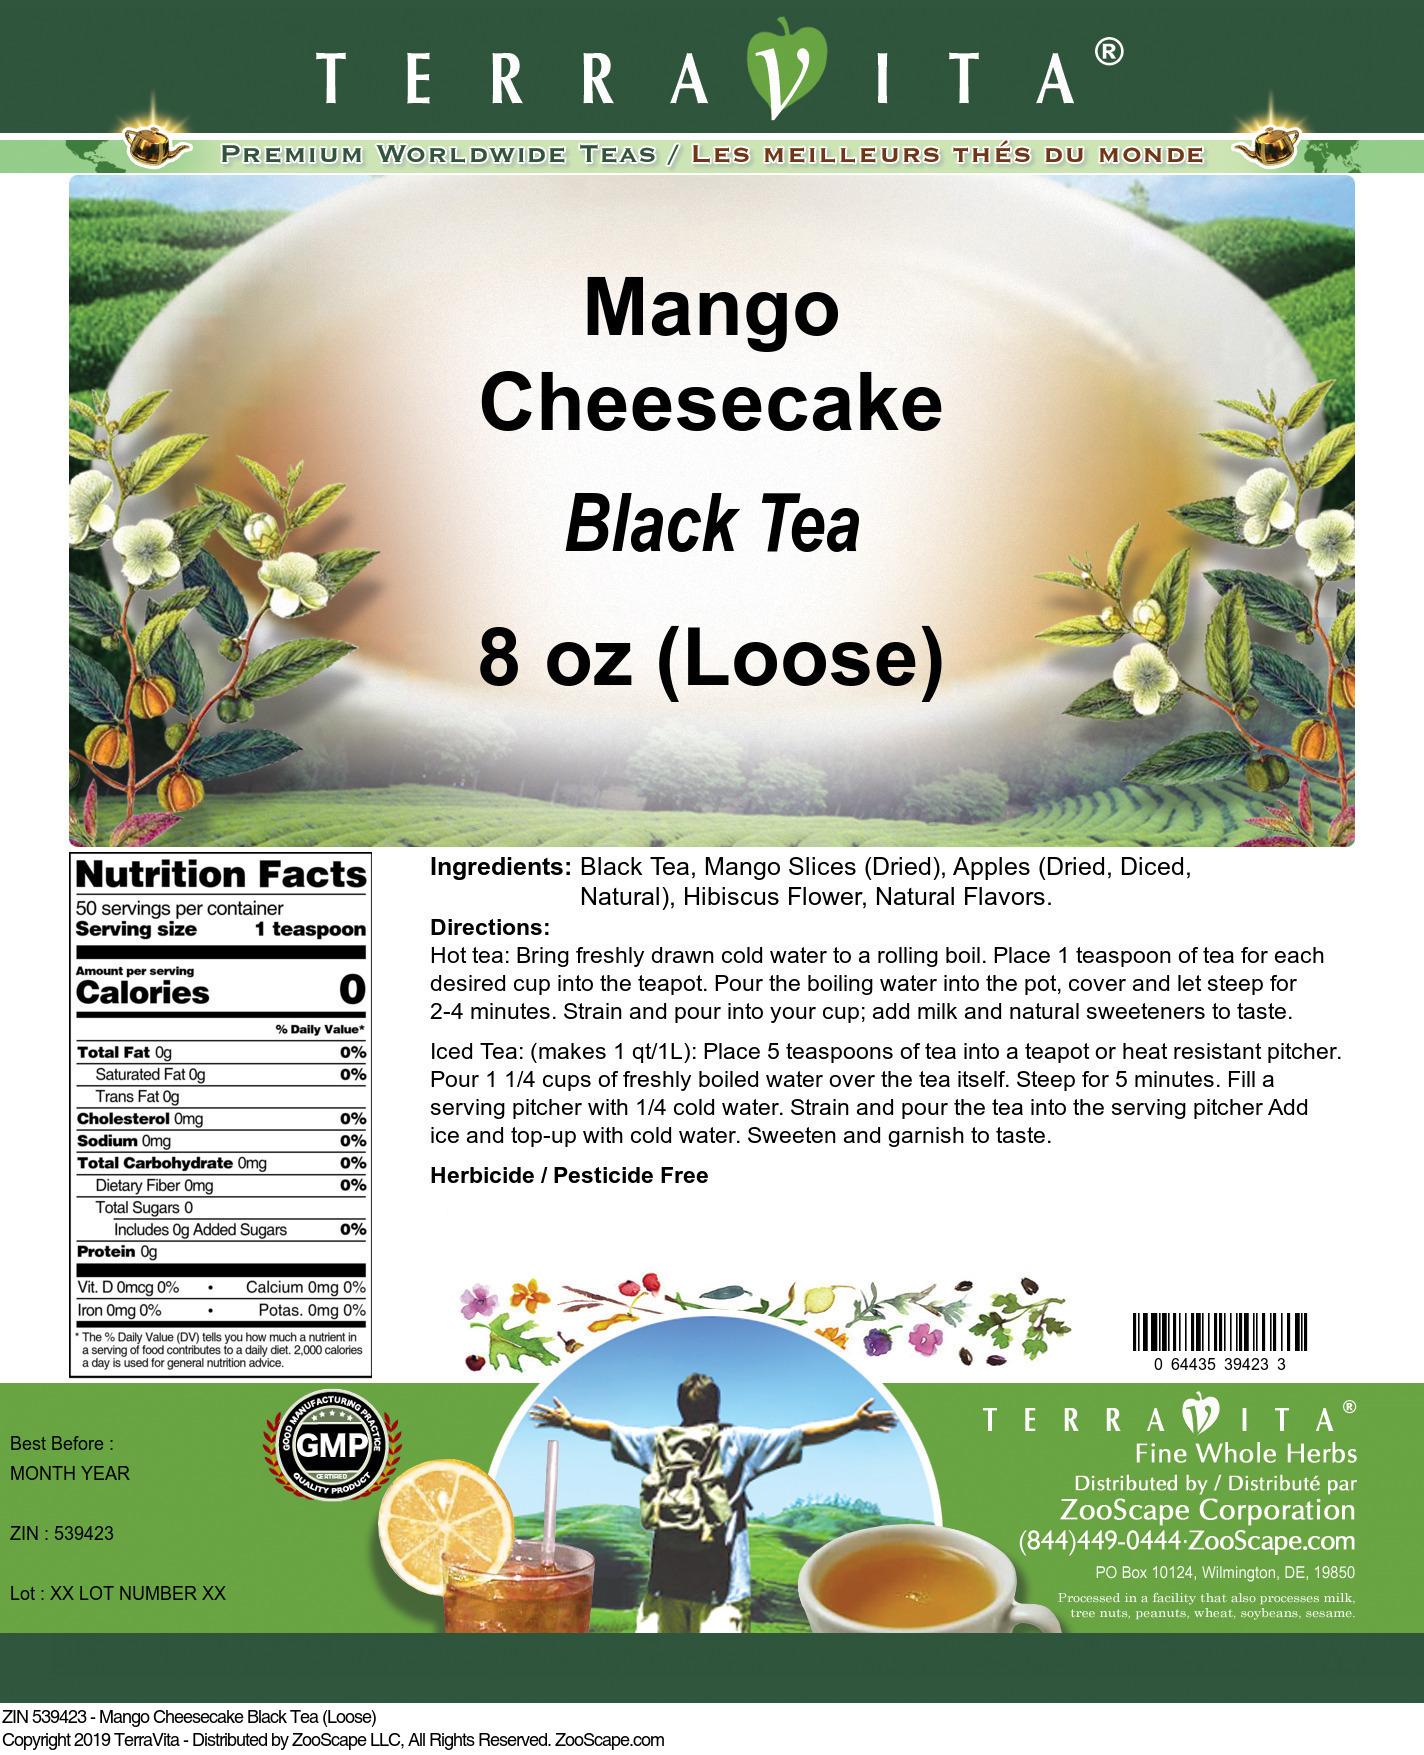 Mango Cheesecake Black Tea (Loose)